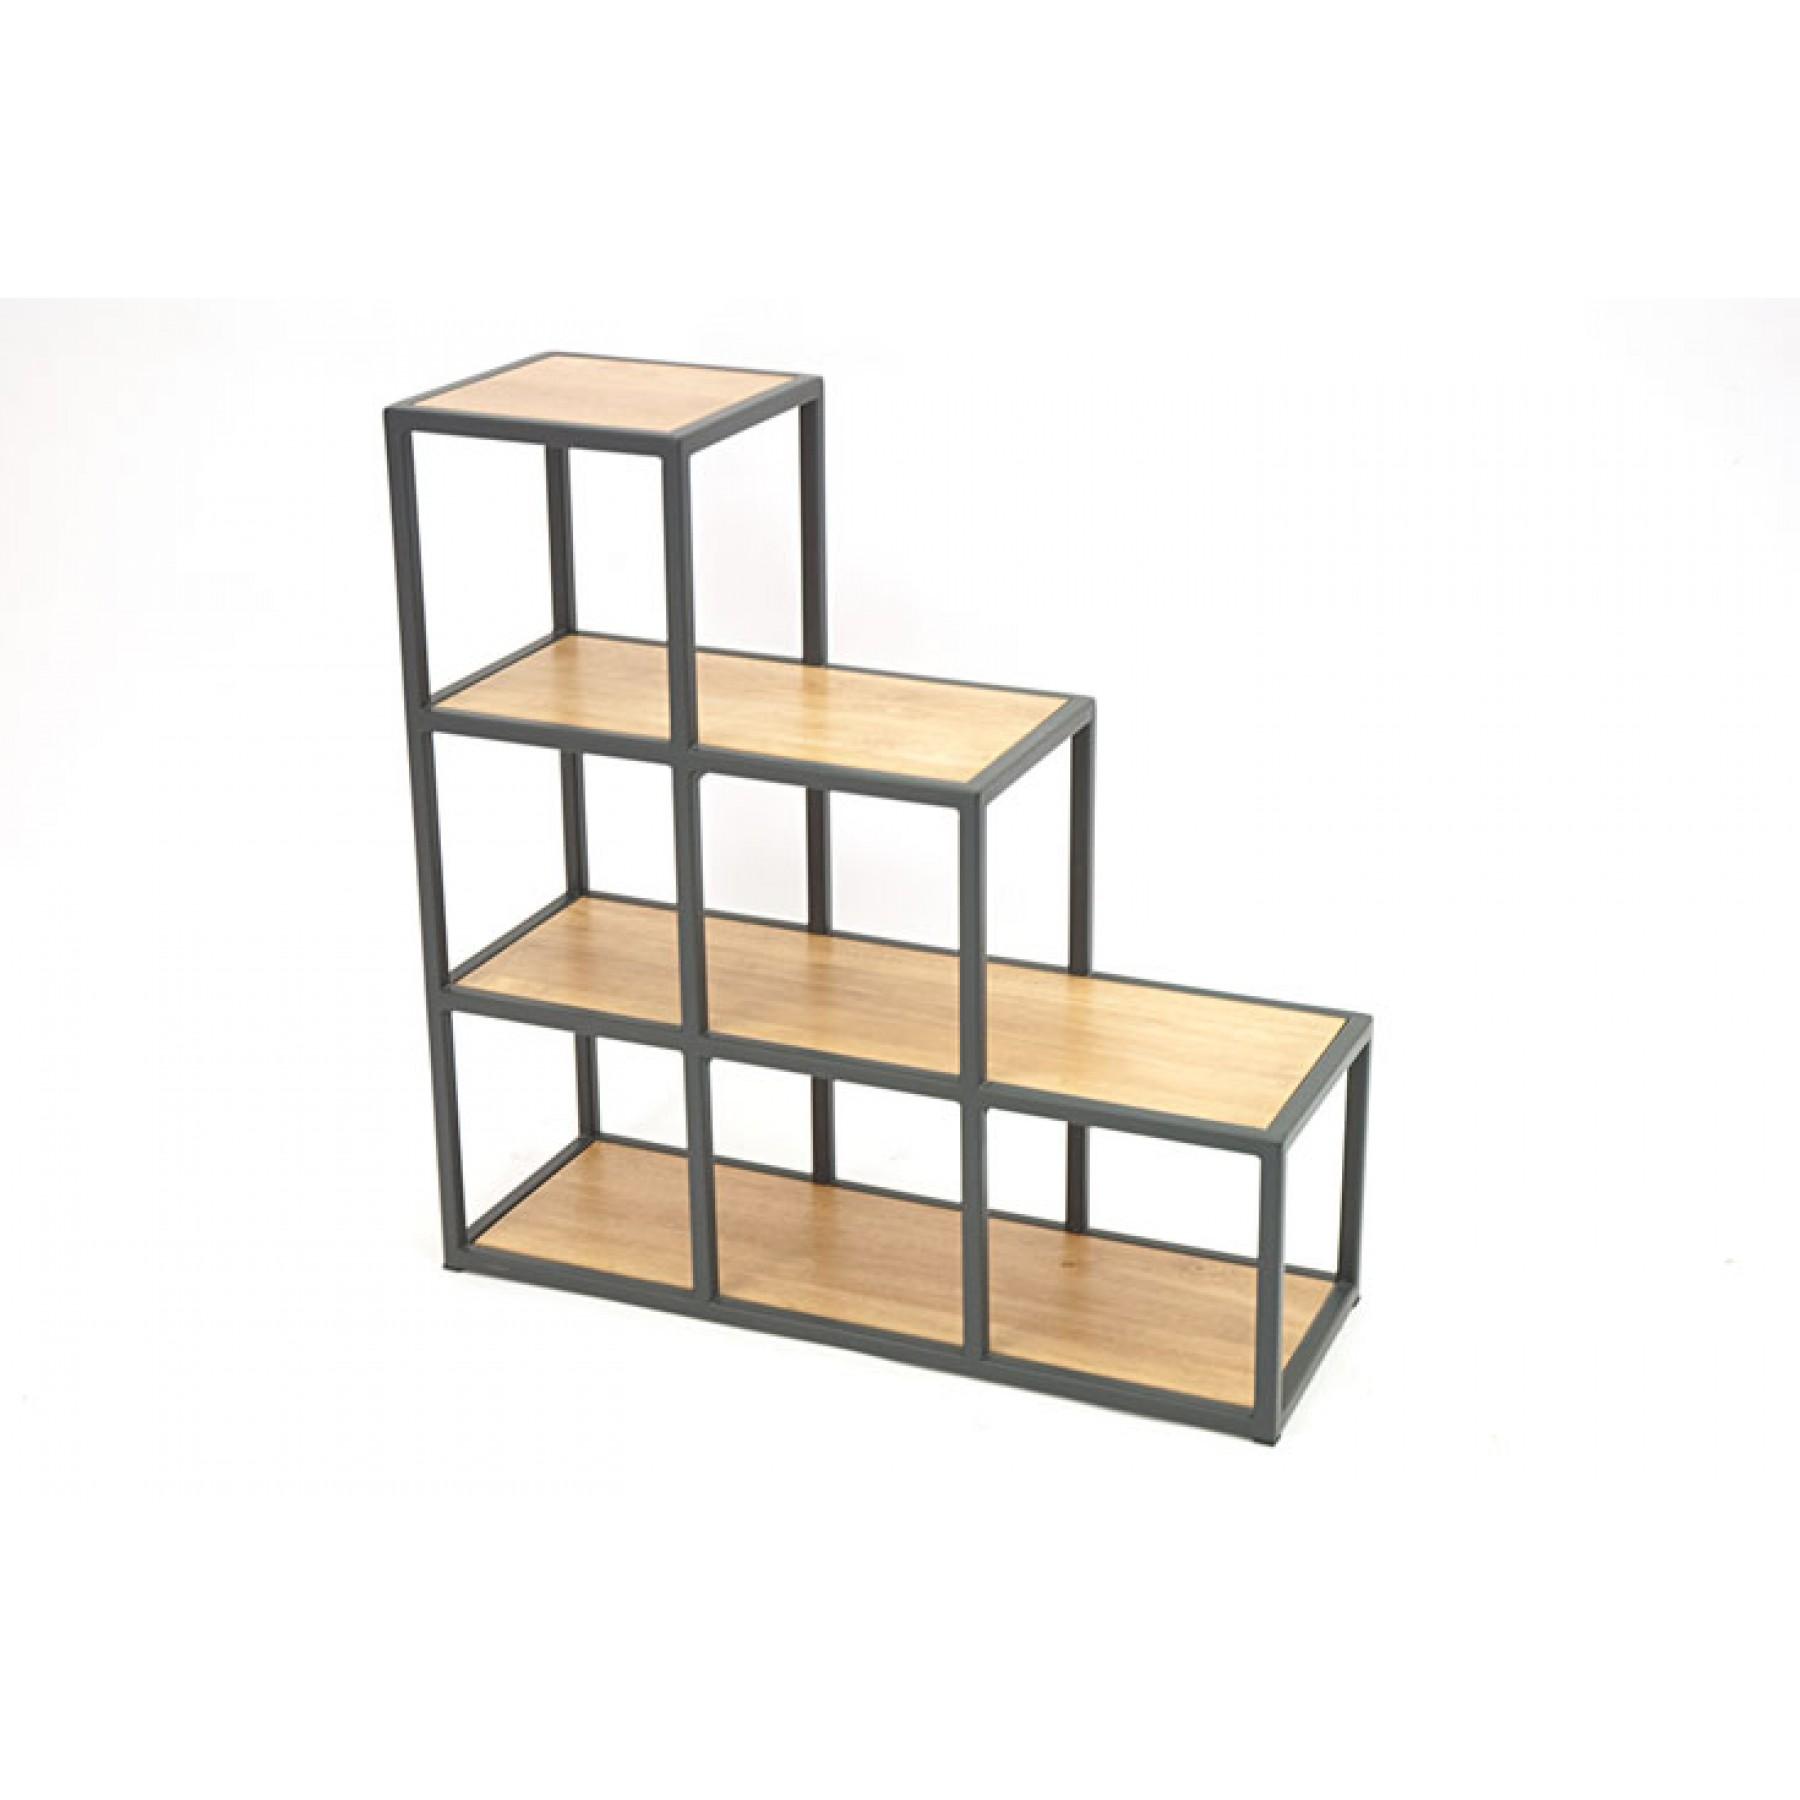 etag re en escalier saxon par nomadde mobilier design. Black Bedroom Furniture Sets. Home Design Ideas